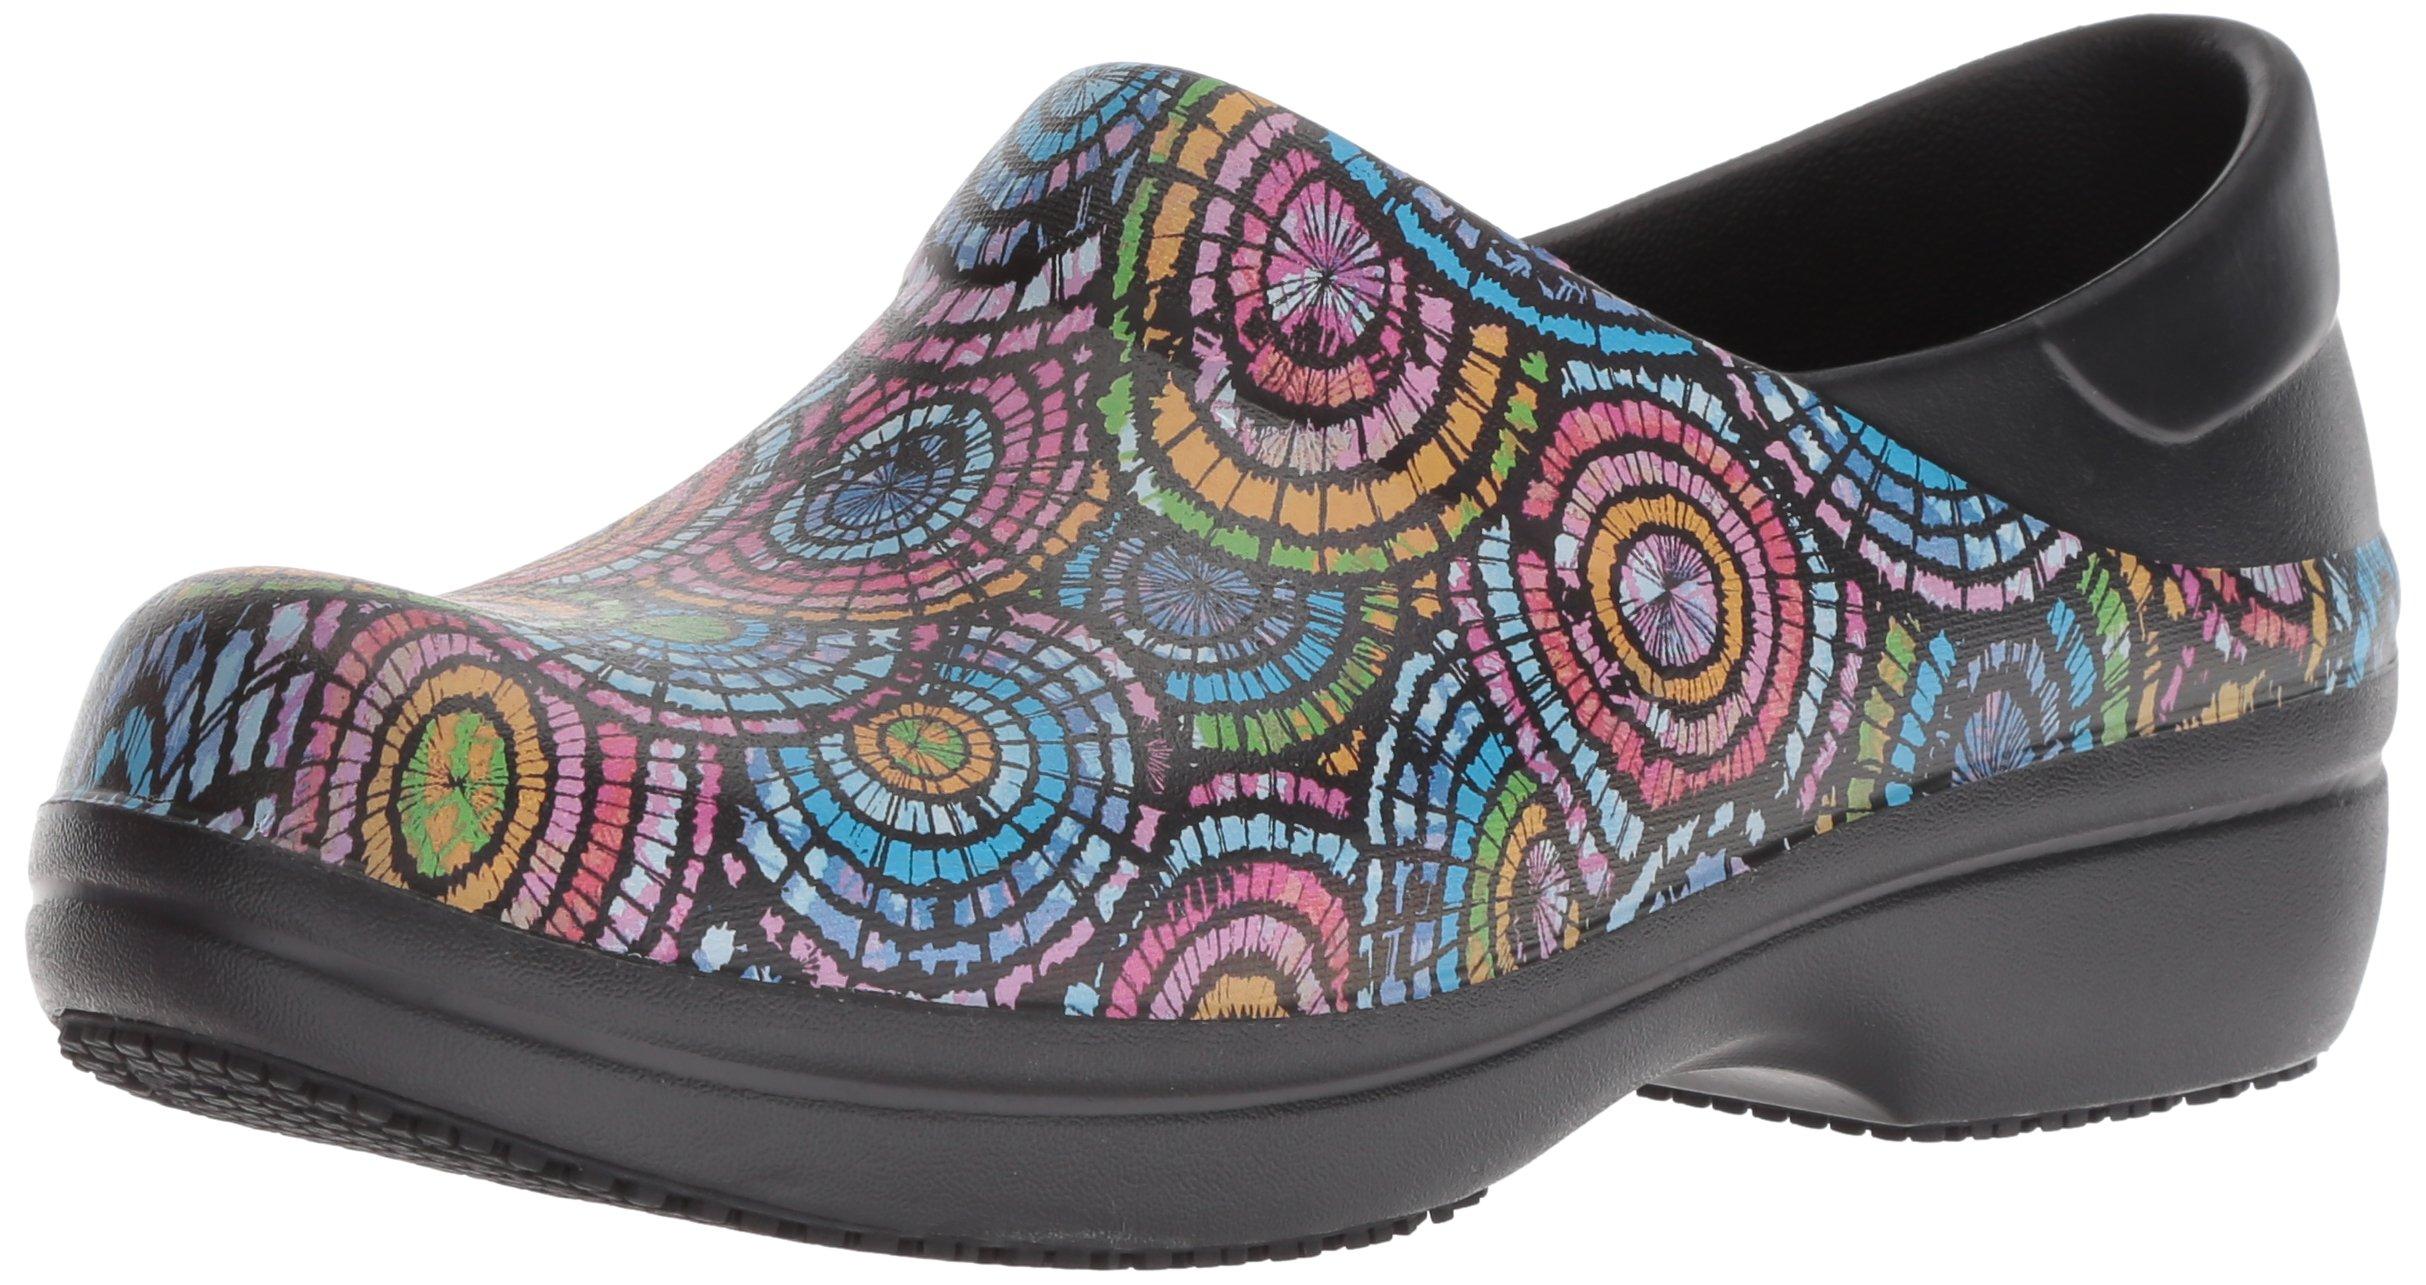 Crocs Women's Neria Pro II Graphic Clog W Shoe, Black/Multi, W9 M US